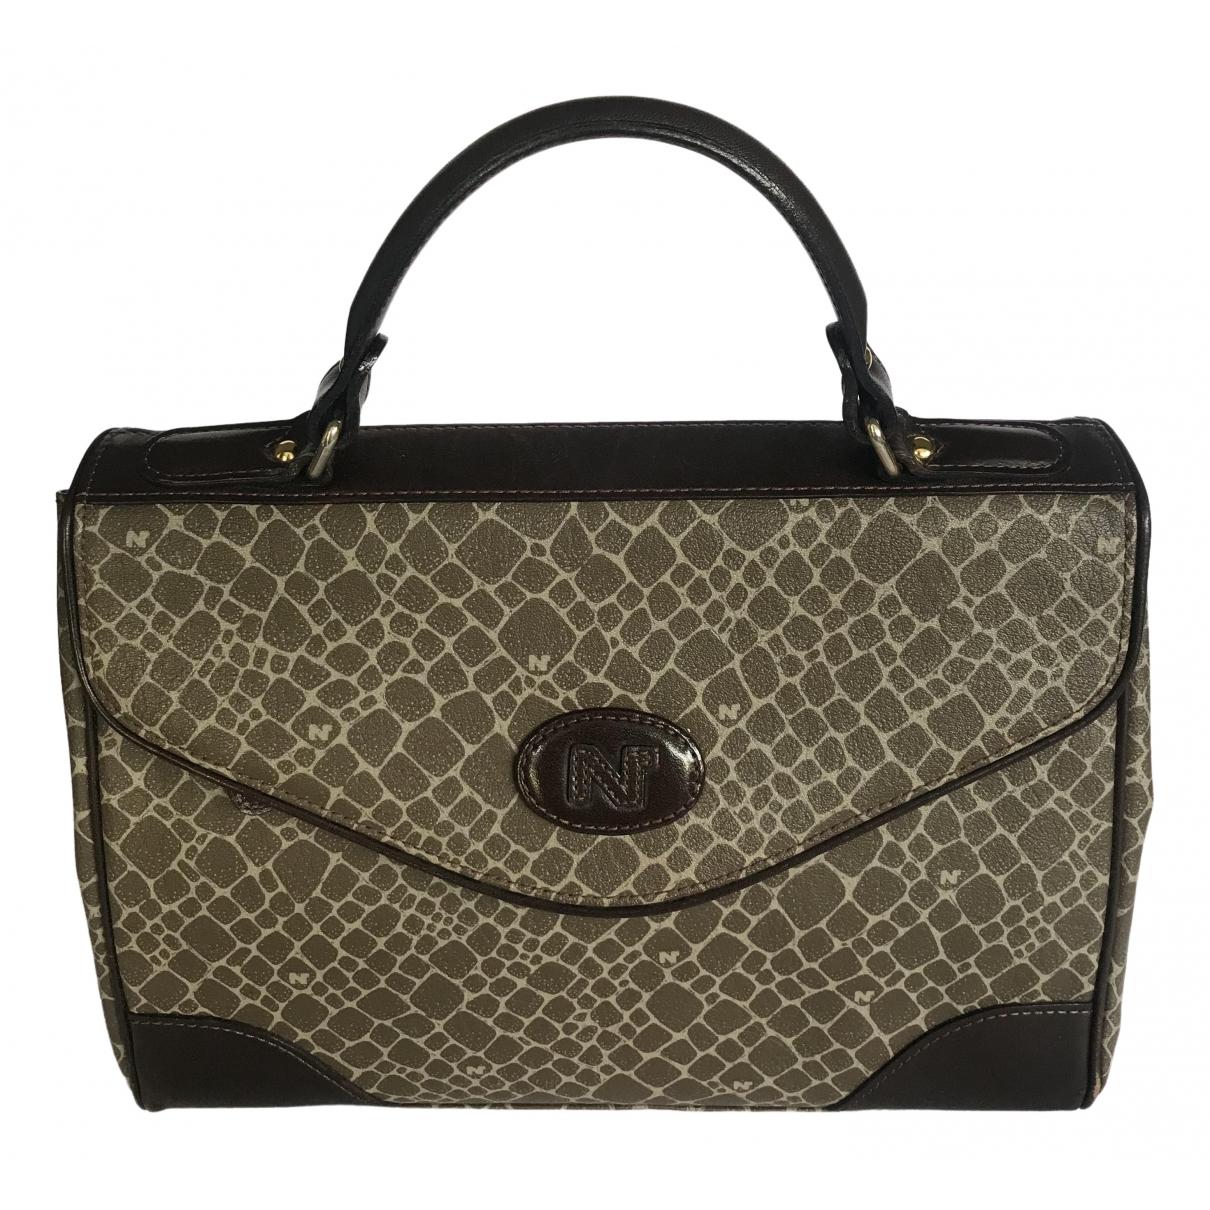 Nina Ricci \N Brown handbag for Women \N